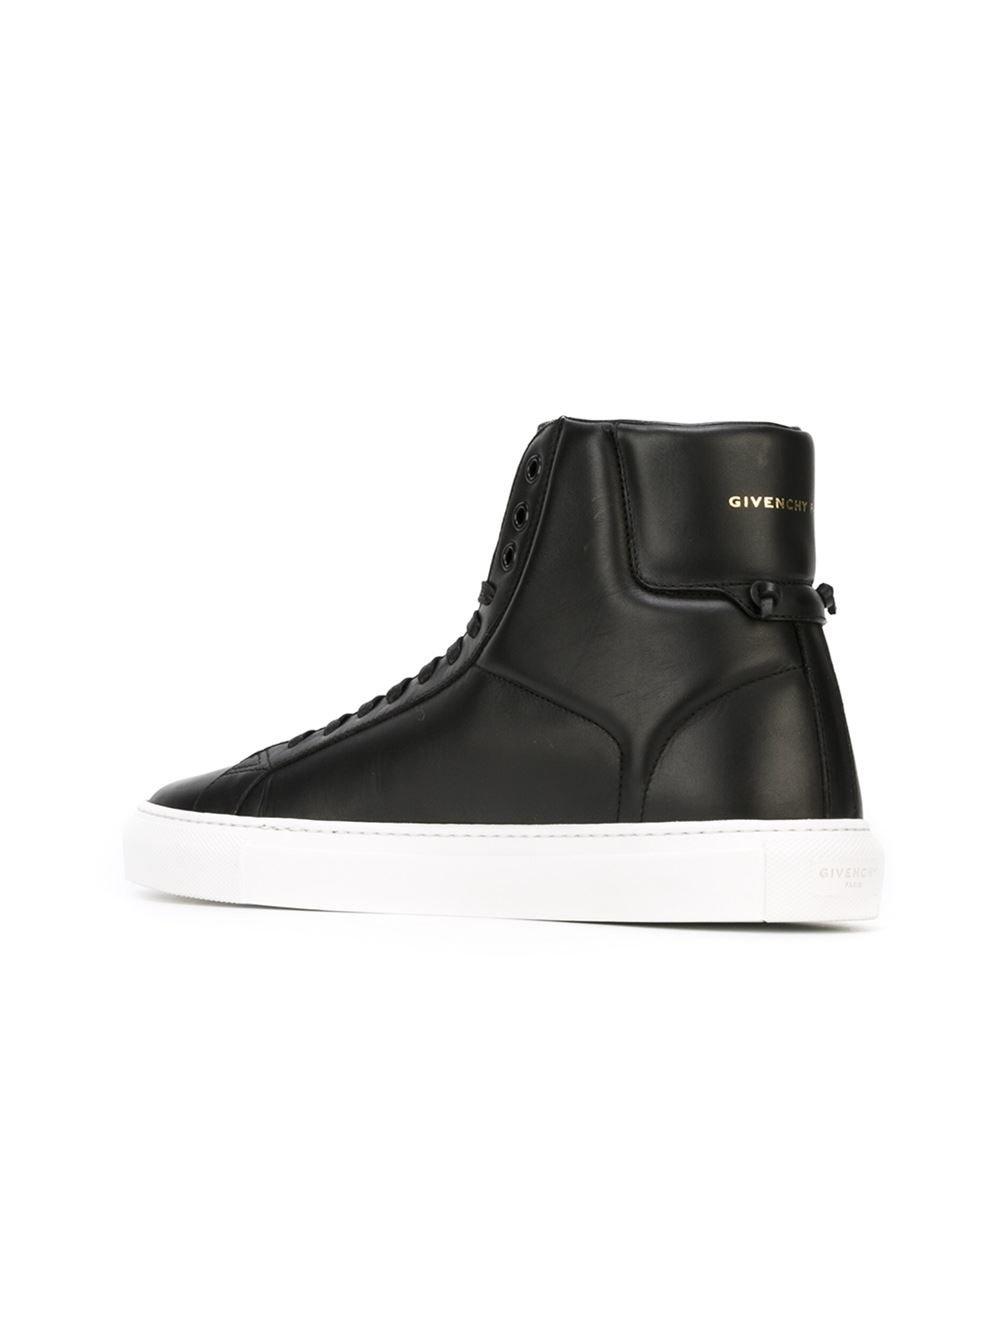 Sneakers of High Seam of Giuseppe Zanotti